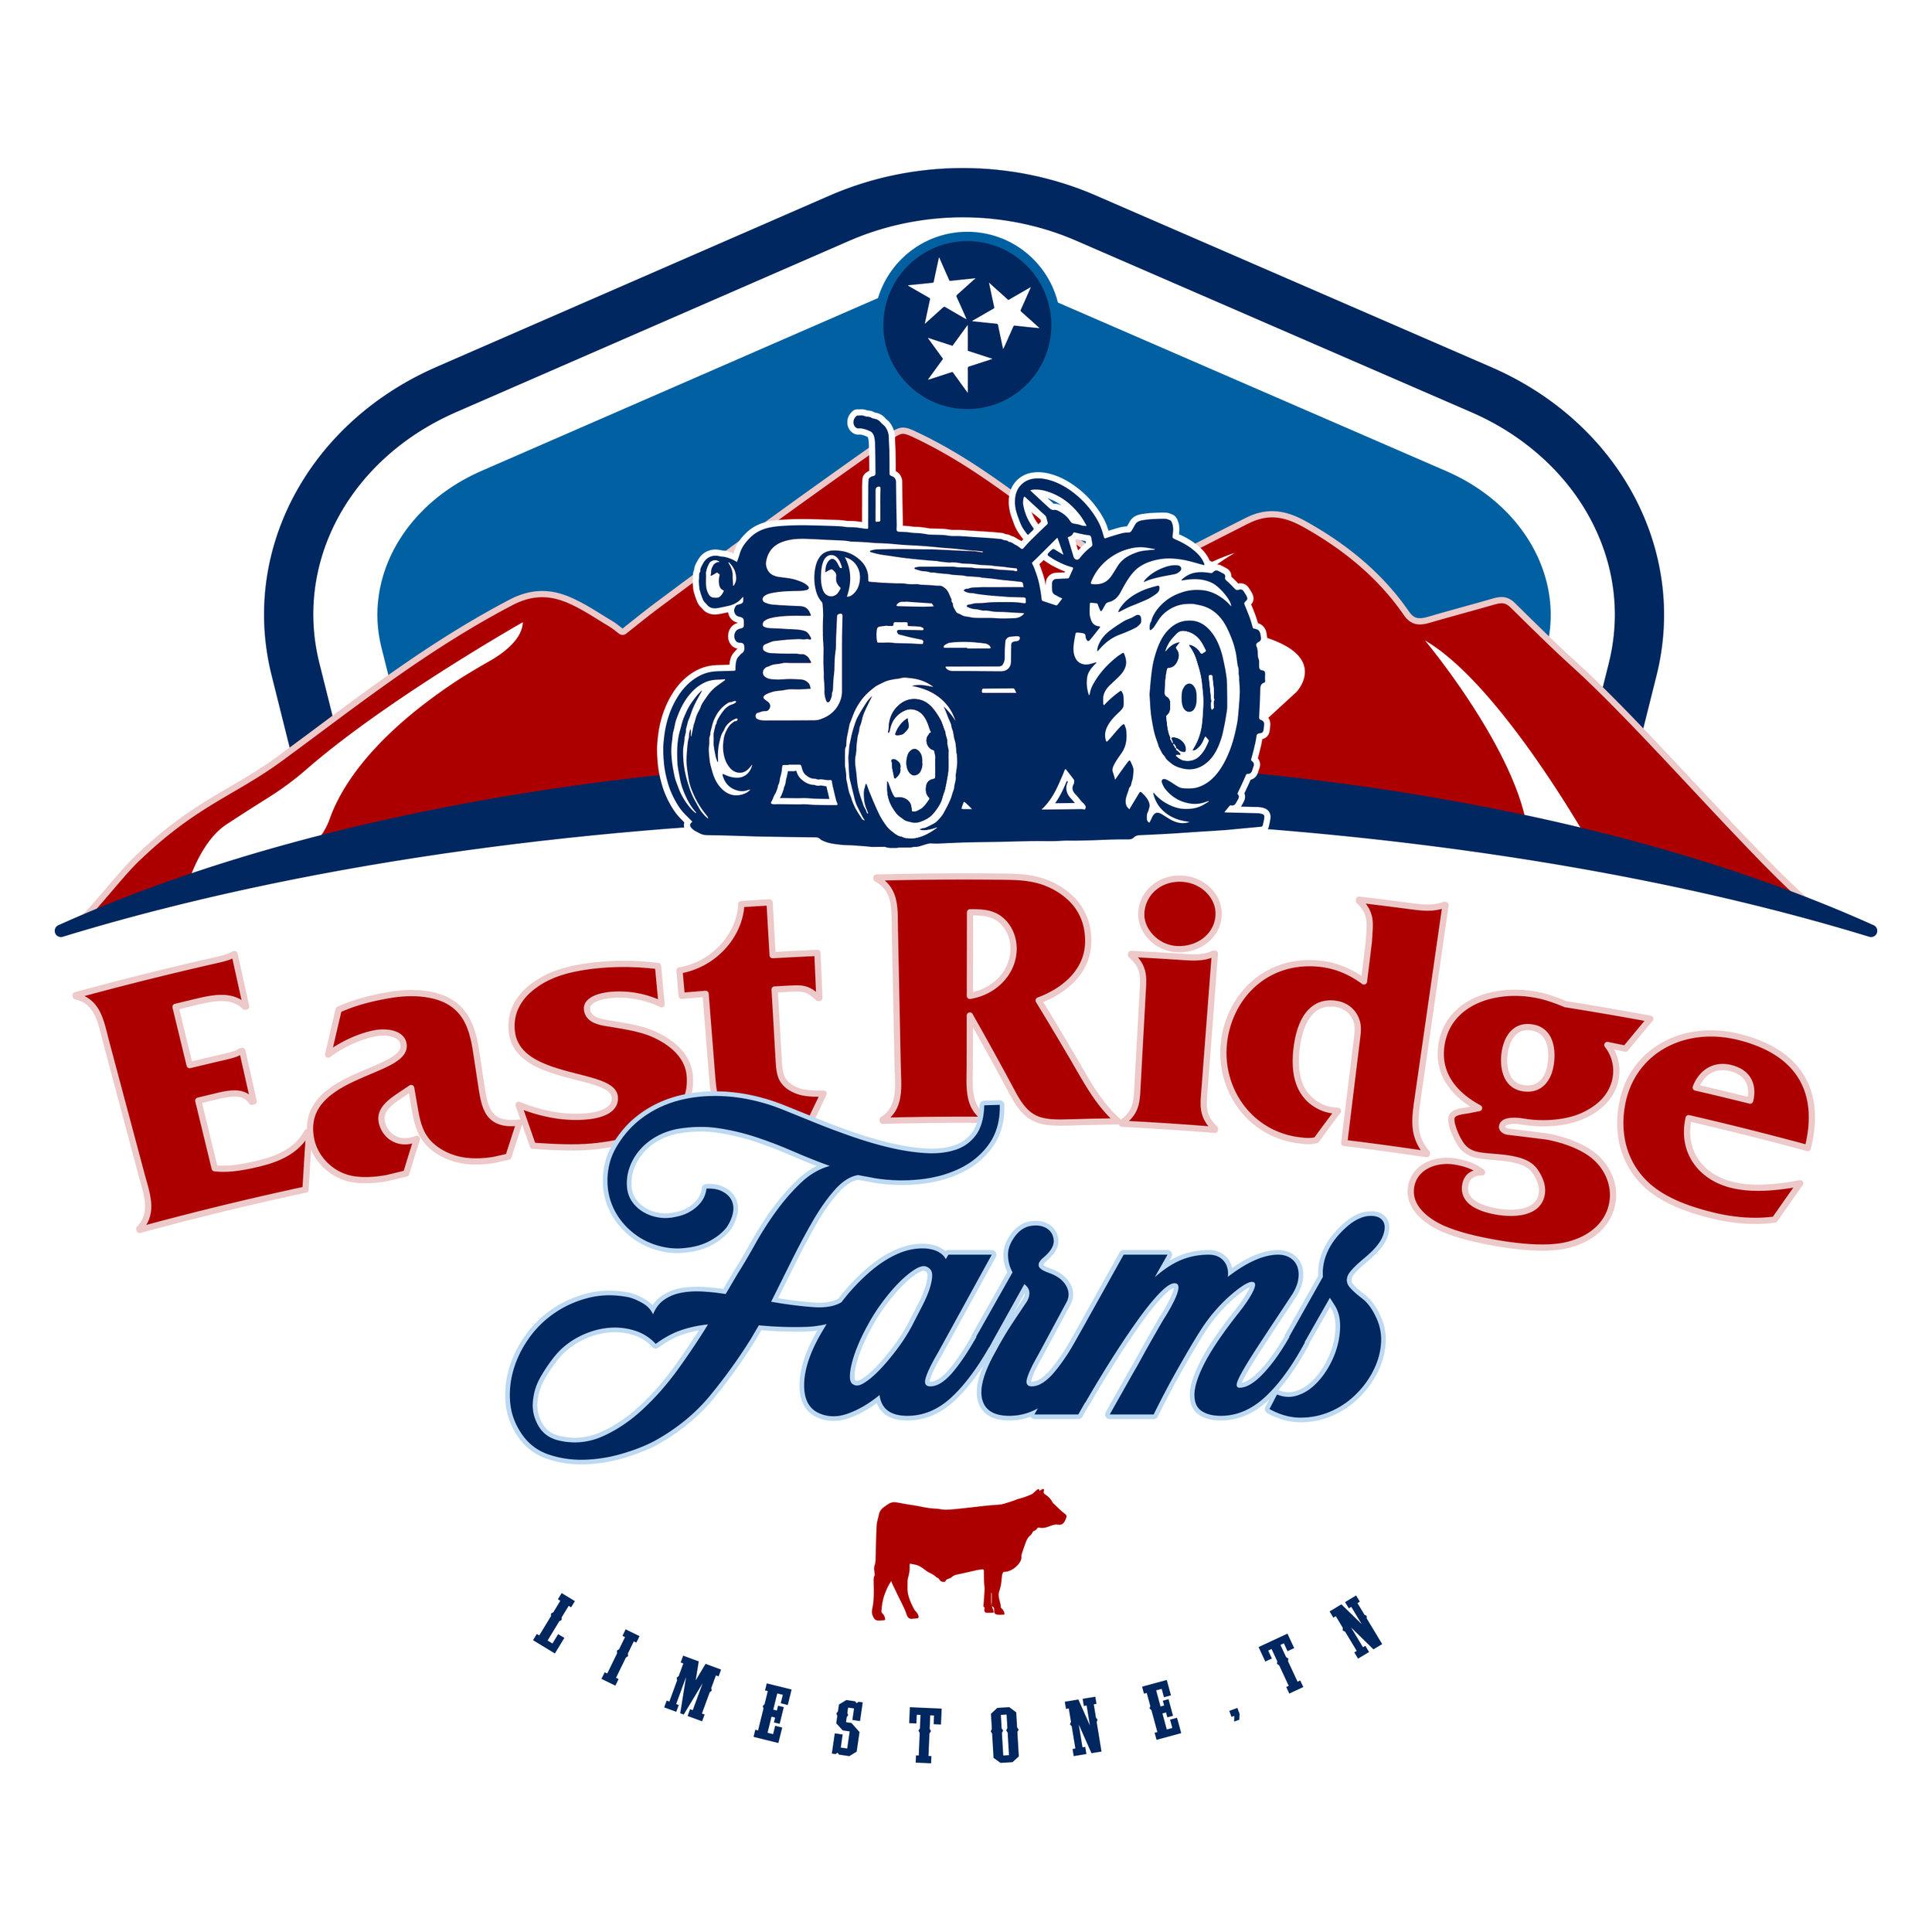 EastRidgeFarmsLOGO-HiRes.jpg